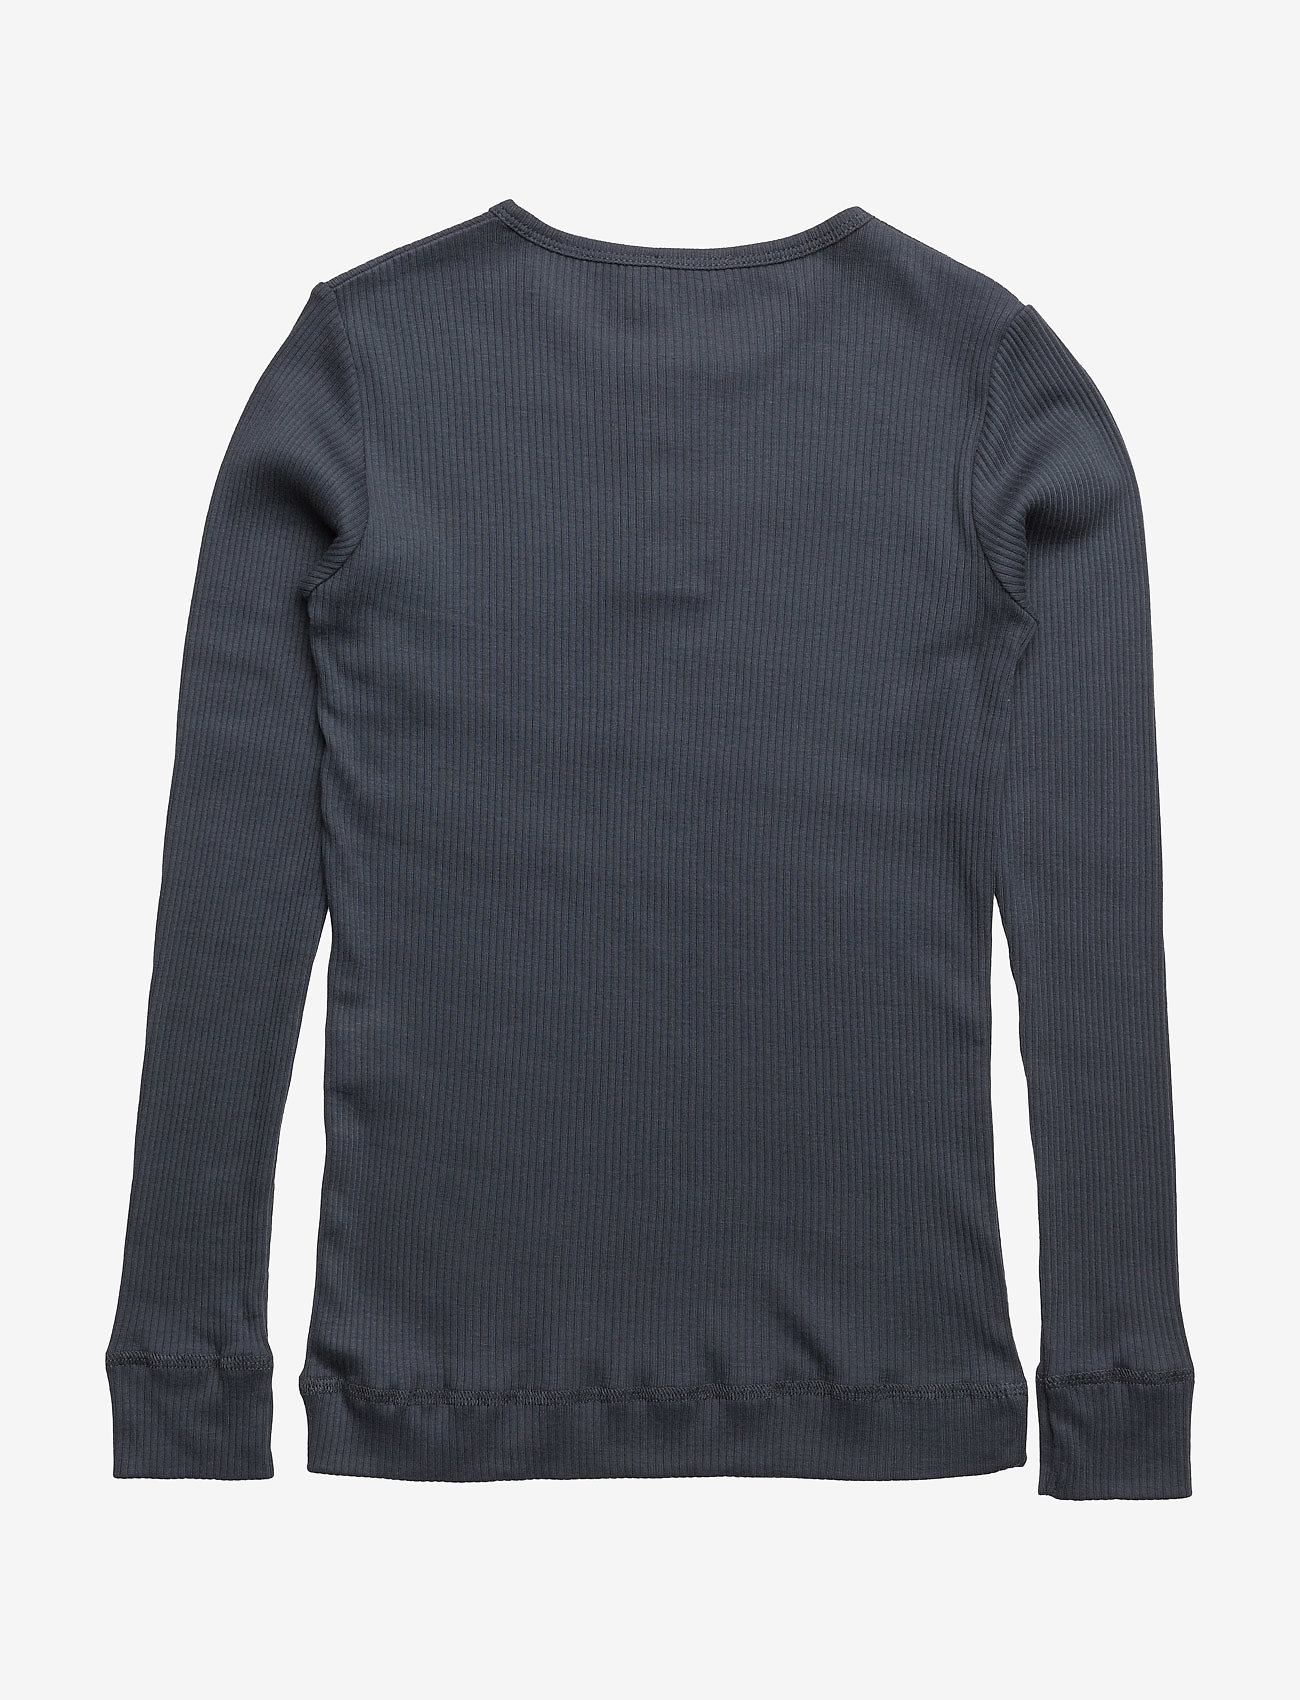 MarMar Cph - Tee LS - long-sleeved t-shirts - blue